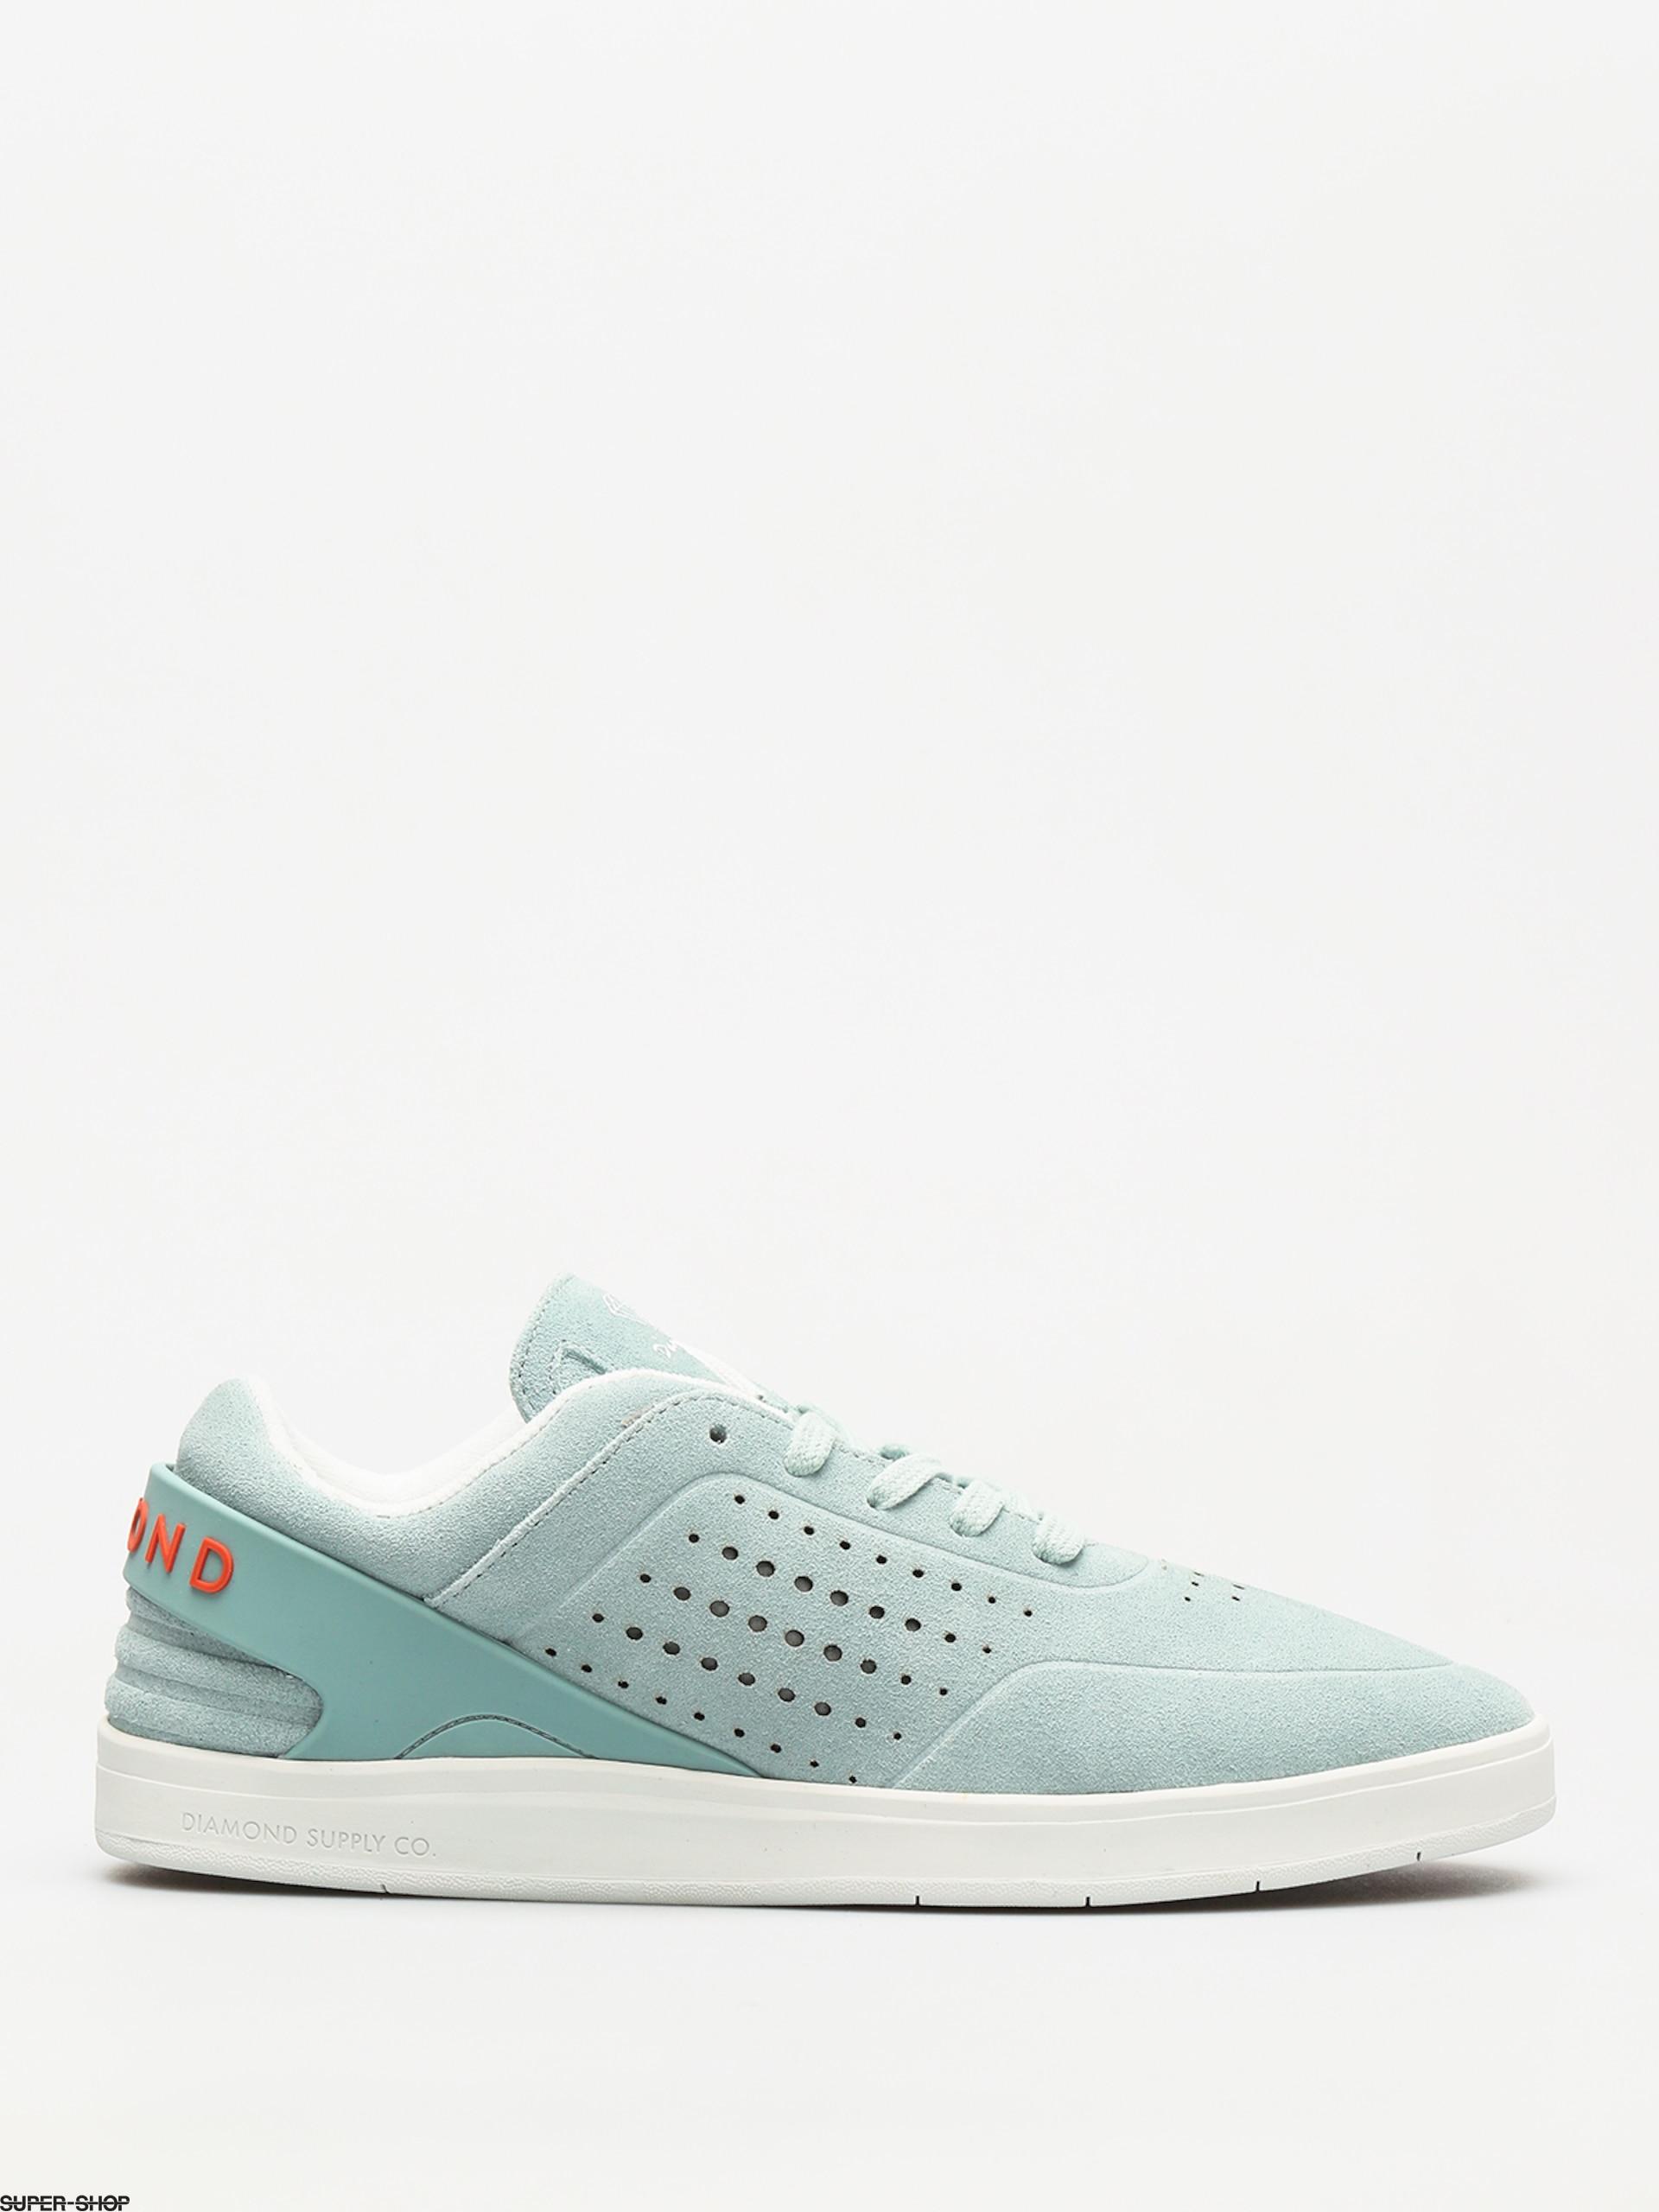 817f4f984f51 967113-w1920-diamond-supply-co-shoes-graphite-aqua.jpg